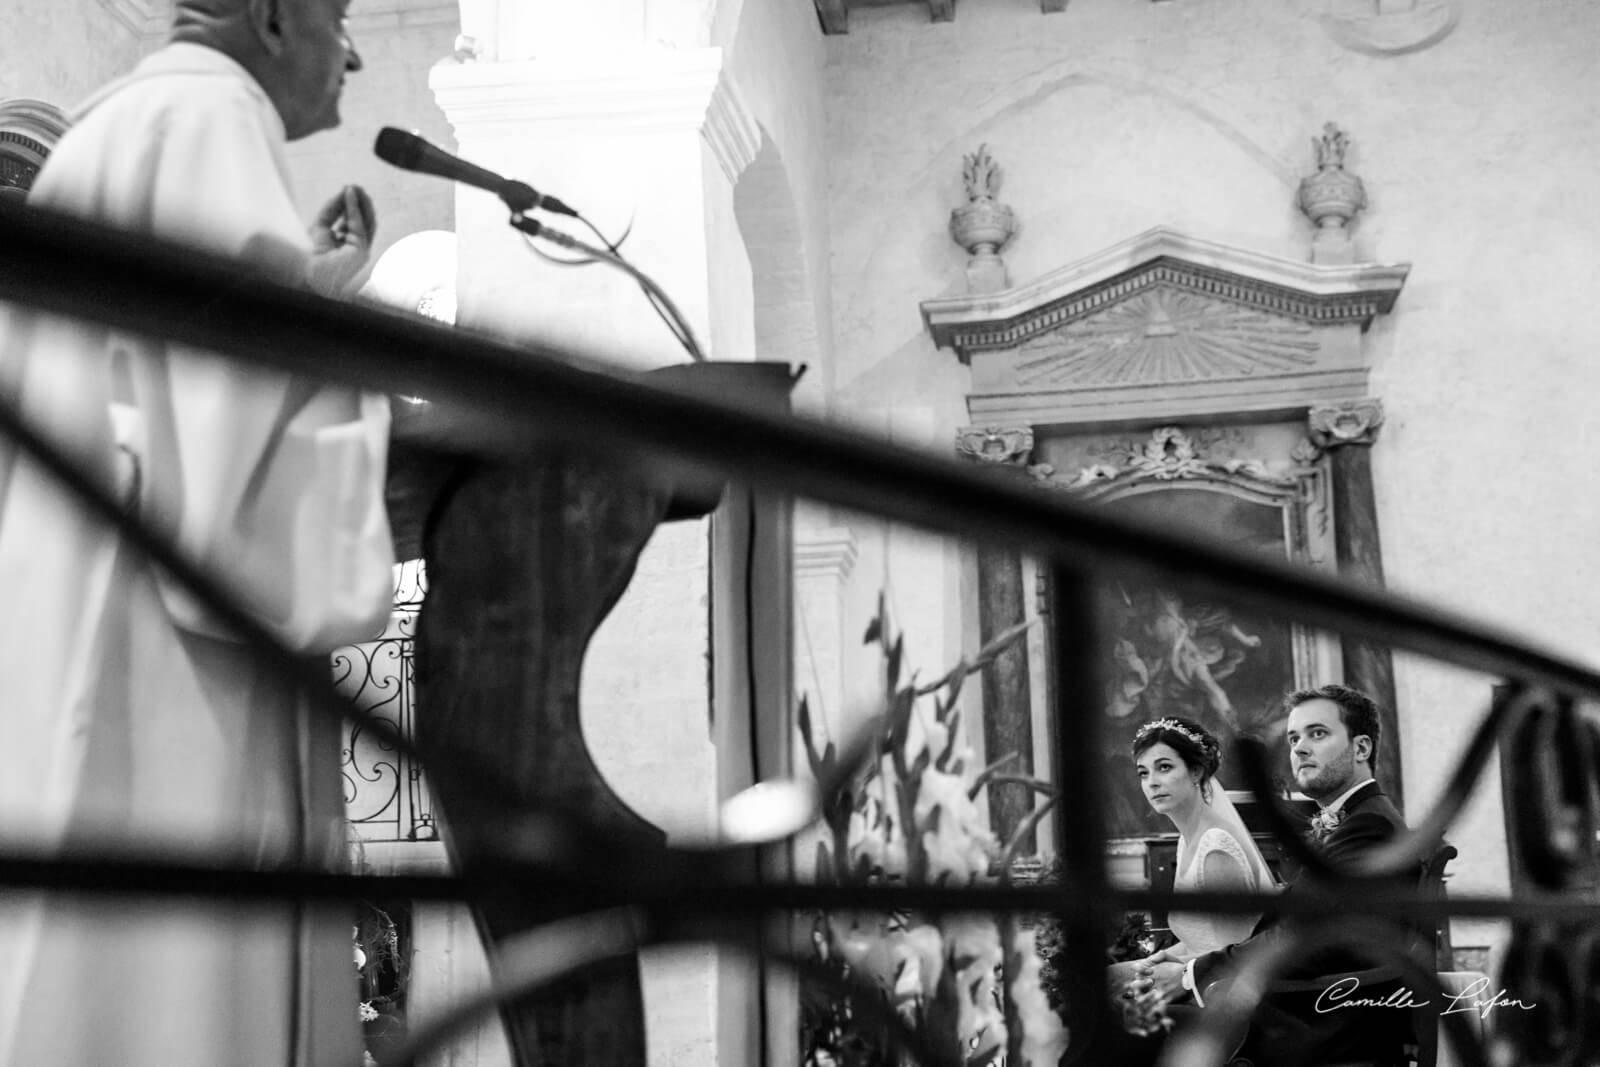 mariage-chateau-sainte-cecile-photographe mariage chateau sainte cecile photographe